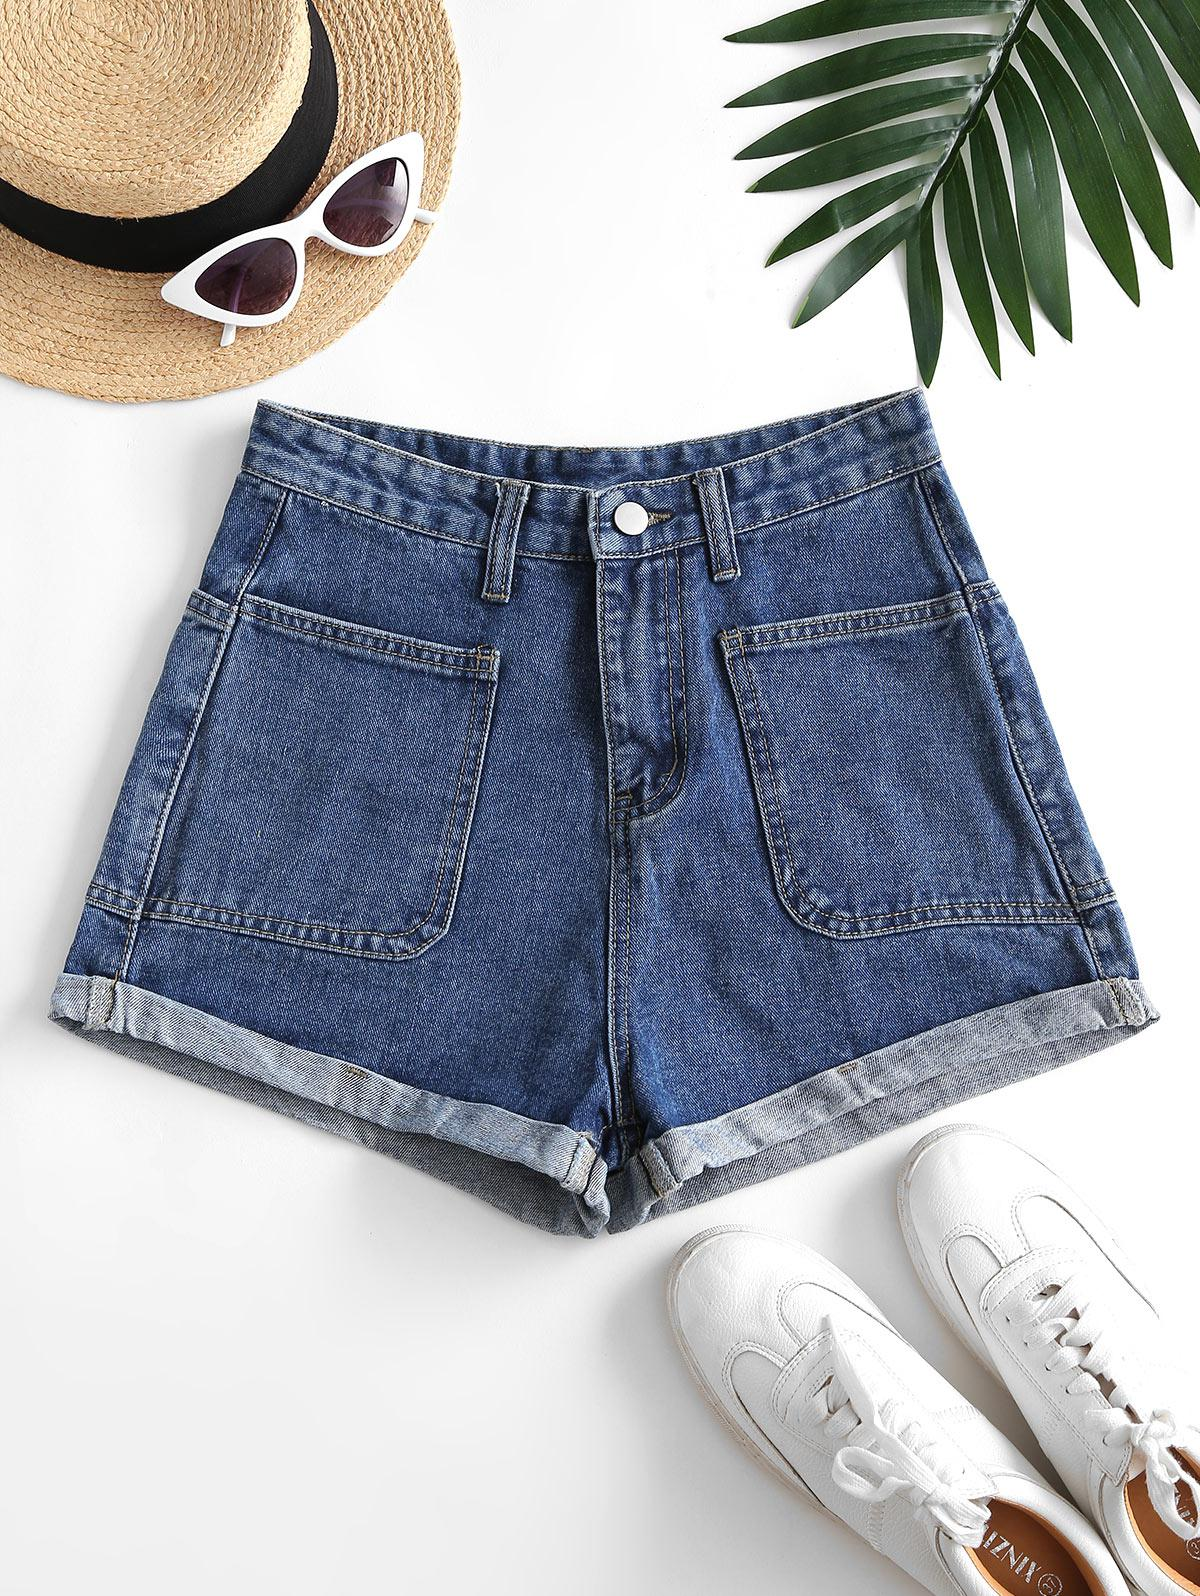 Cuffed Hem Four Pockets Denim Shorts